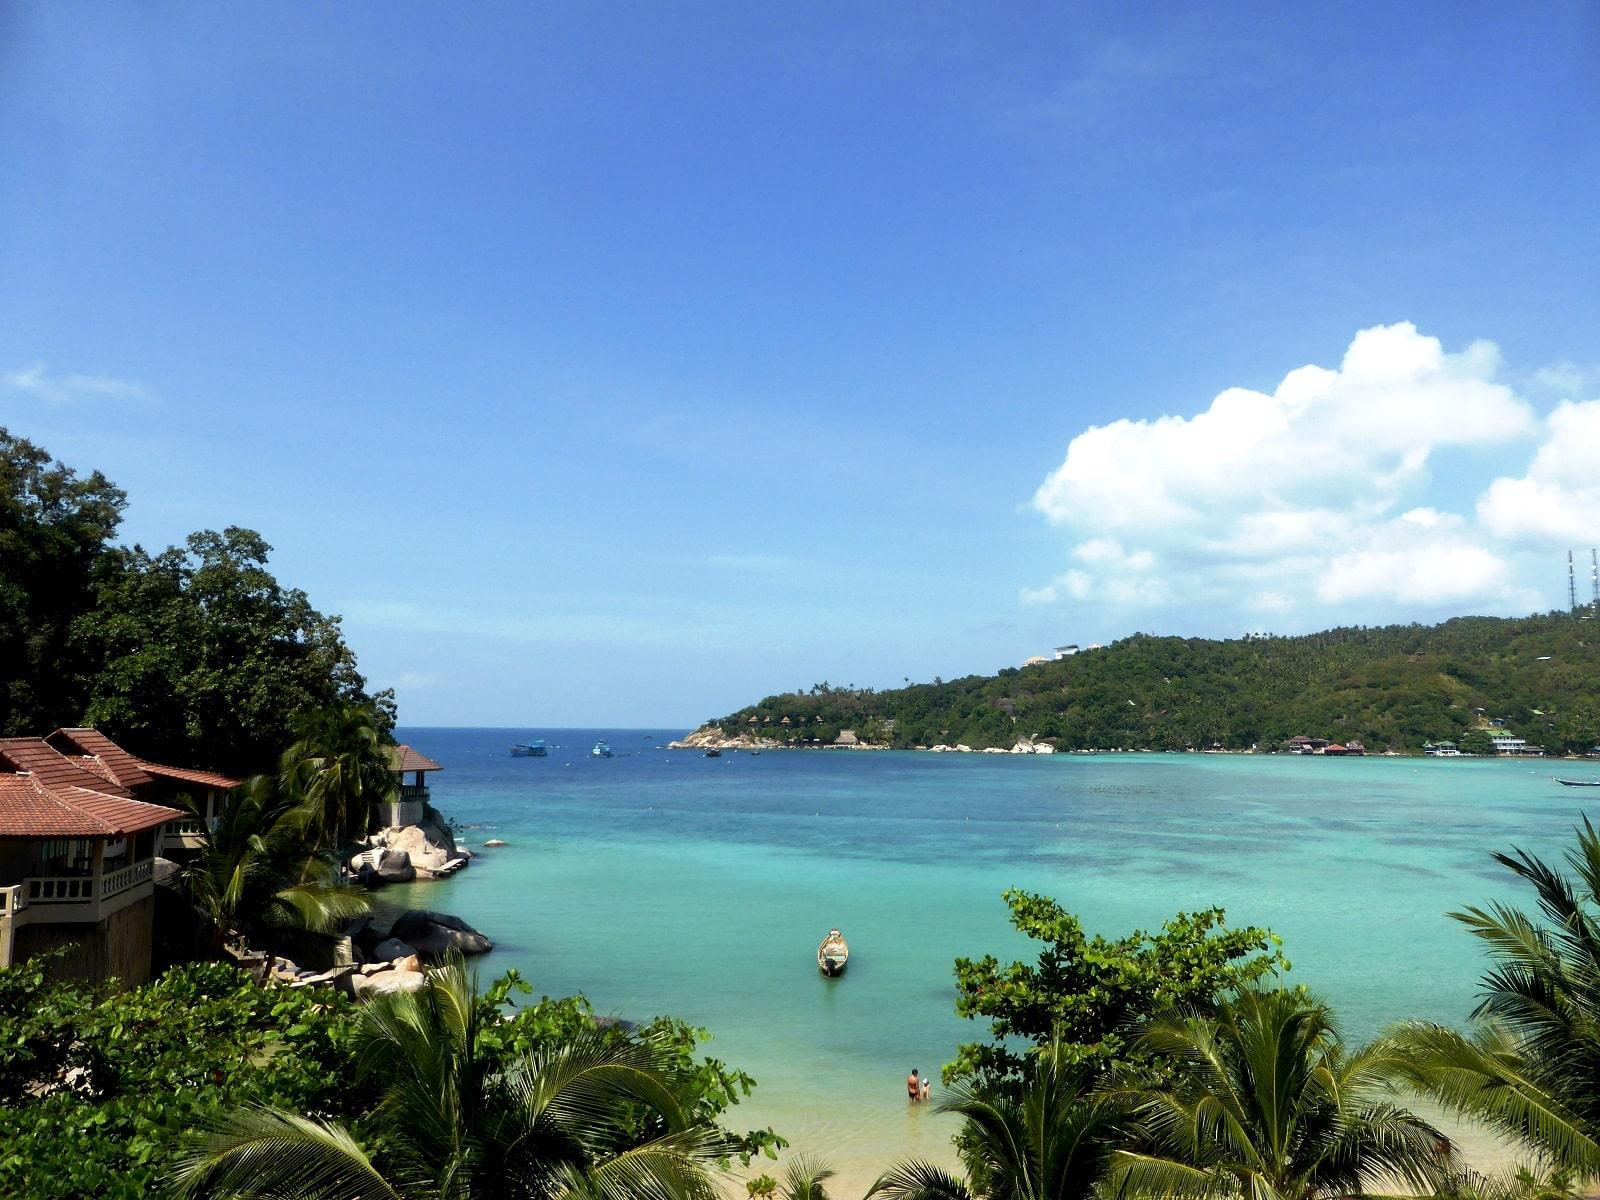 Les îles de Thaïlande : de Koh Tao à Koh Phangan